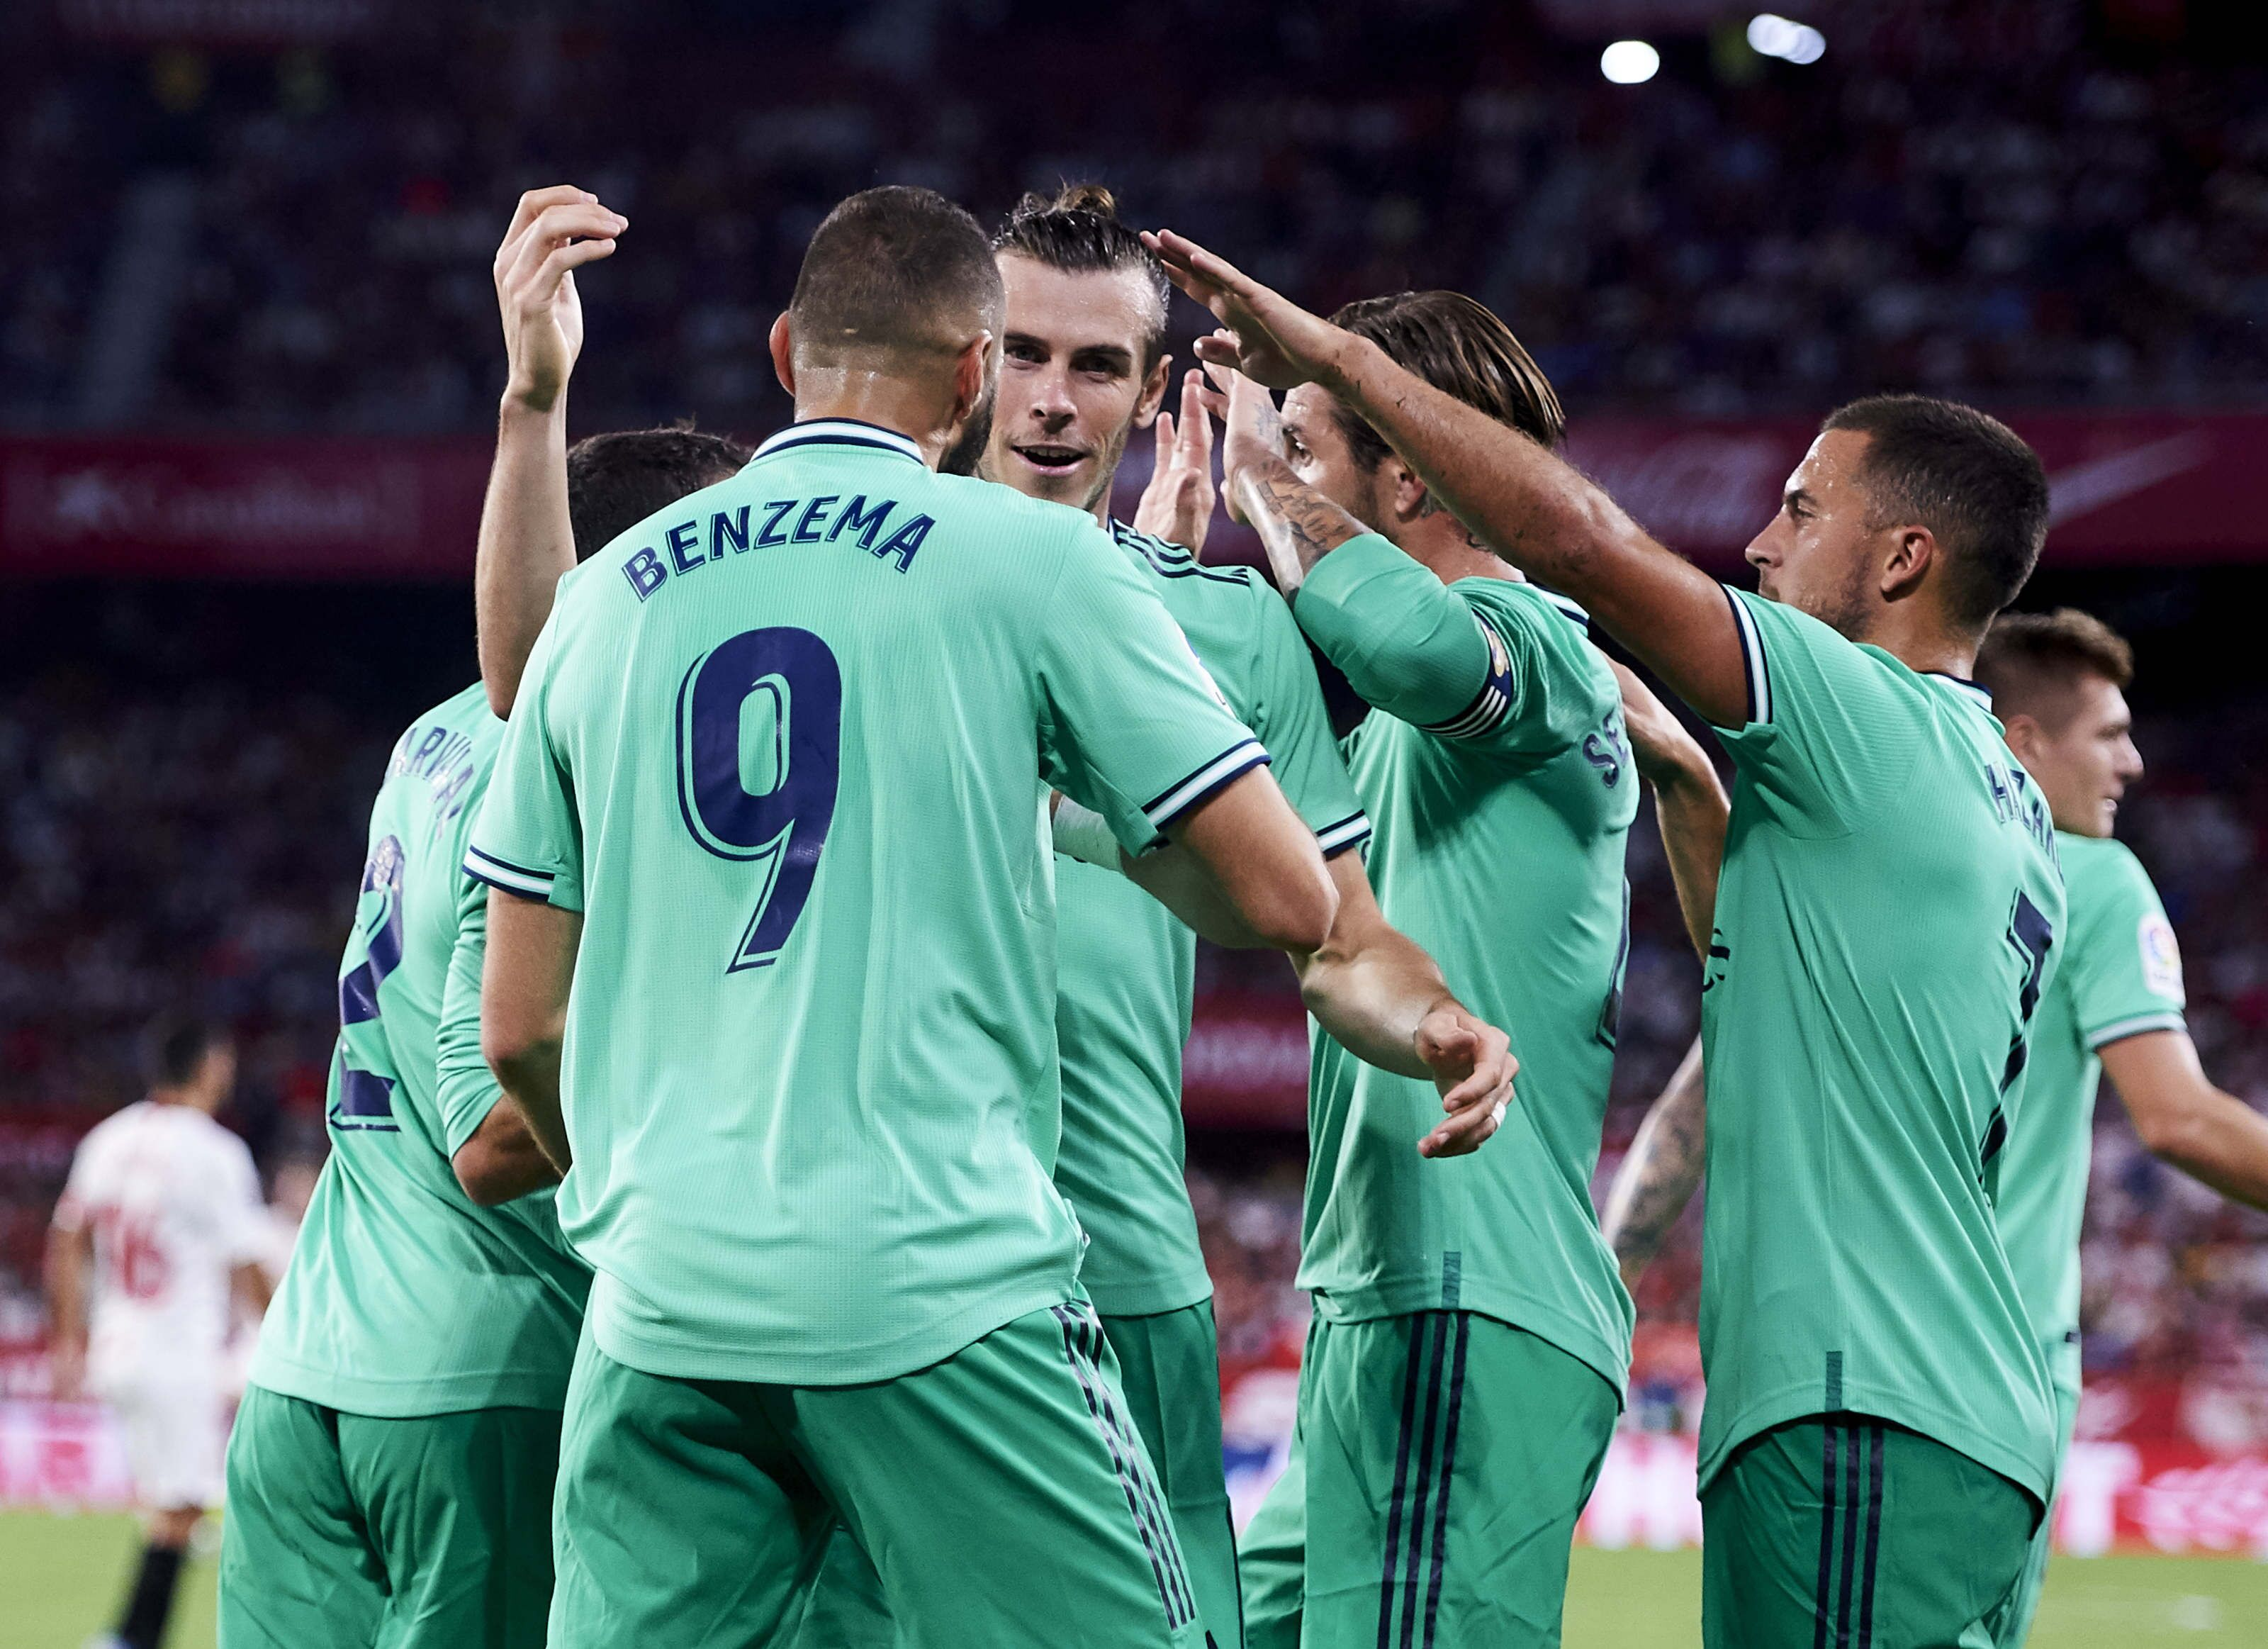 Real Madrid Player Ratings vs. Sevilla: Casemiro dominates the midfield